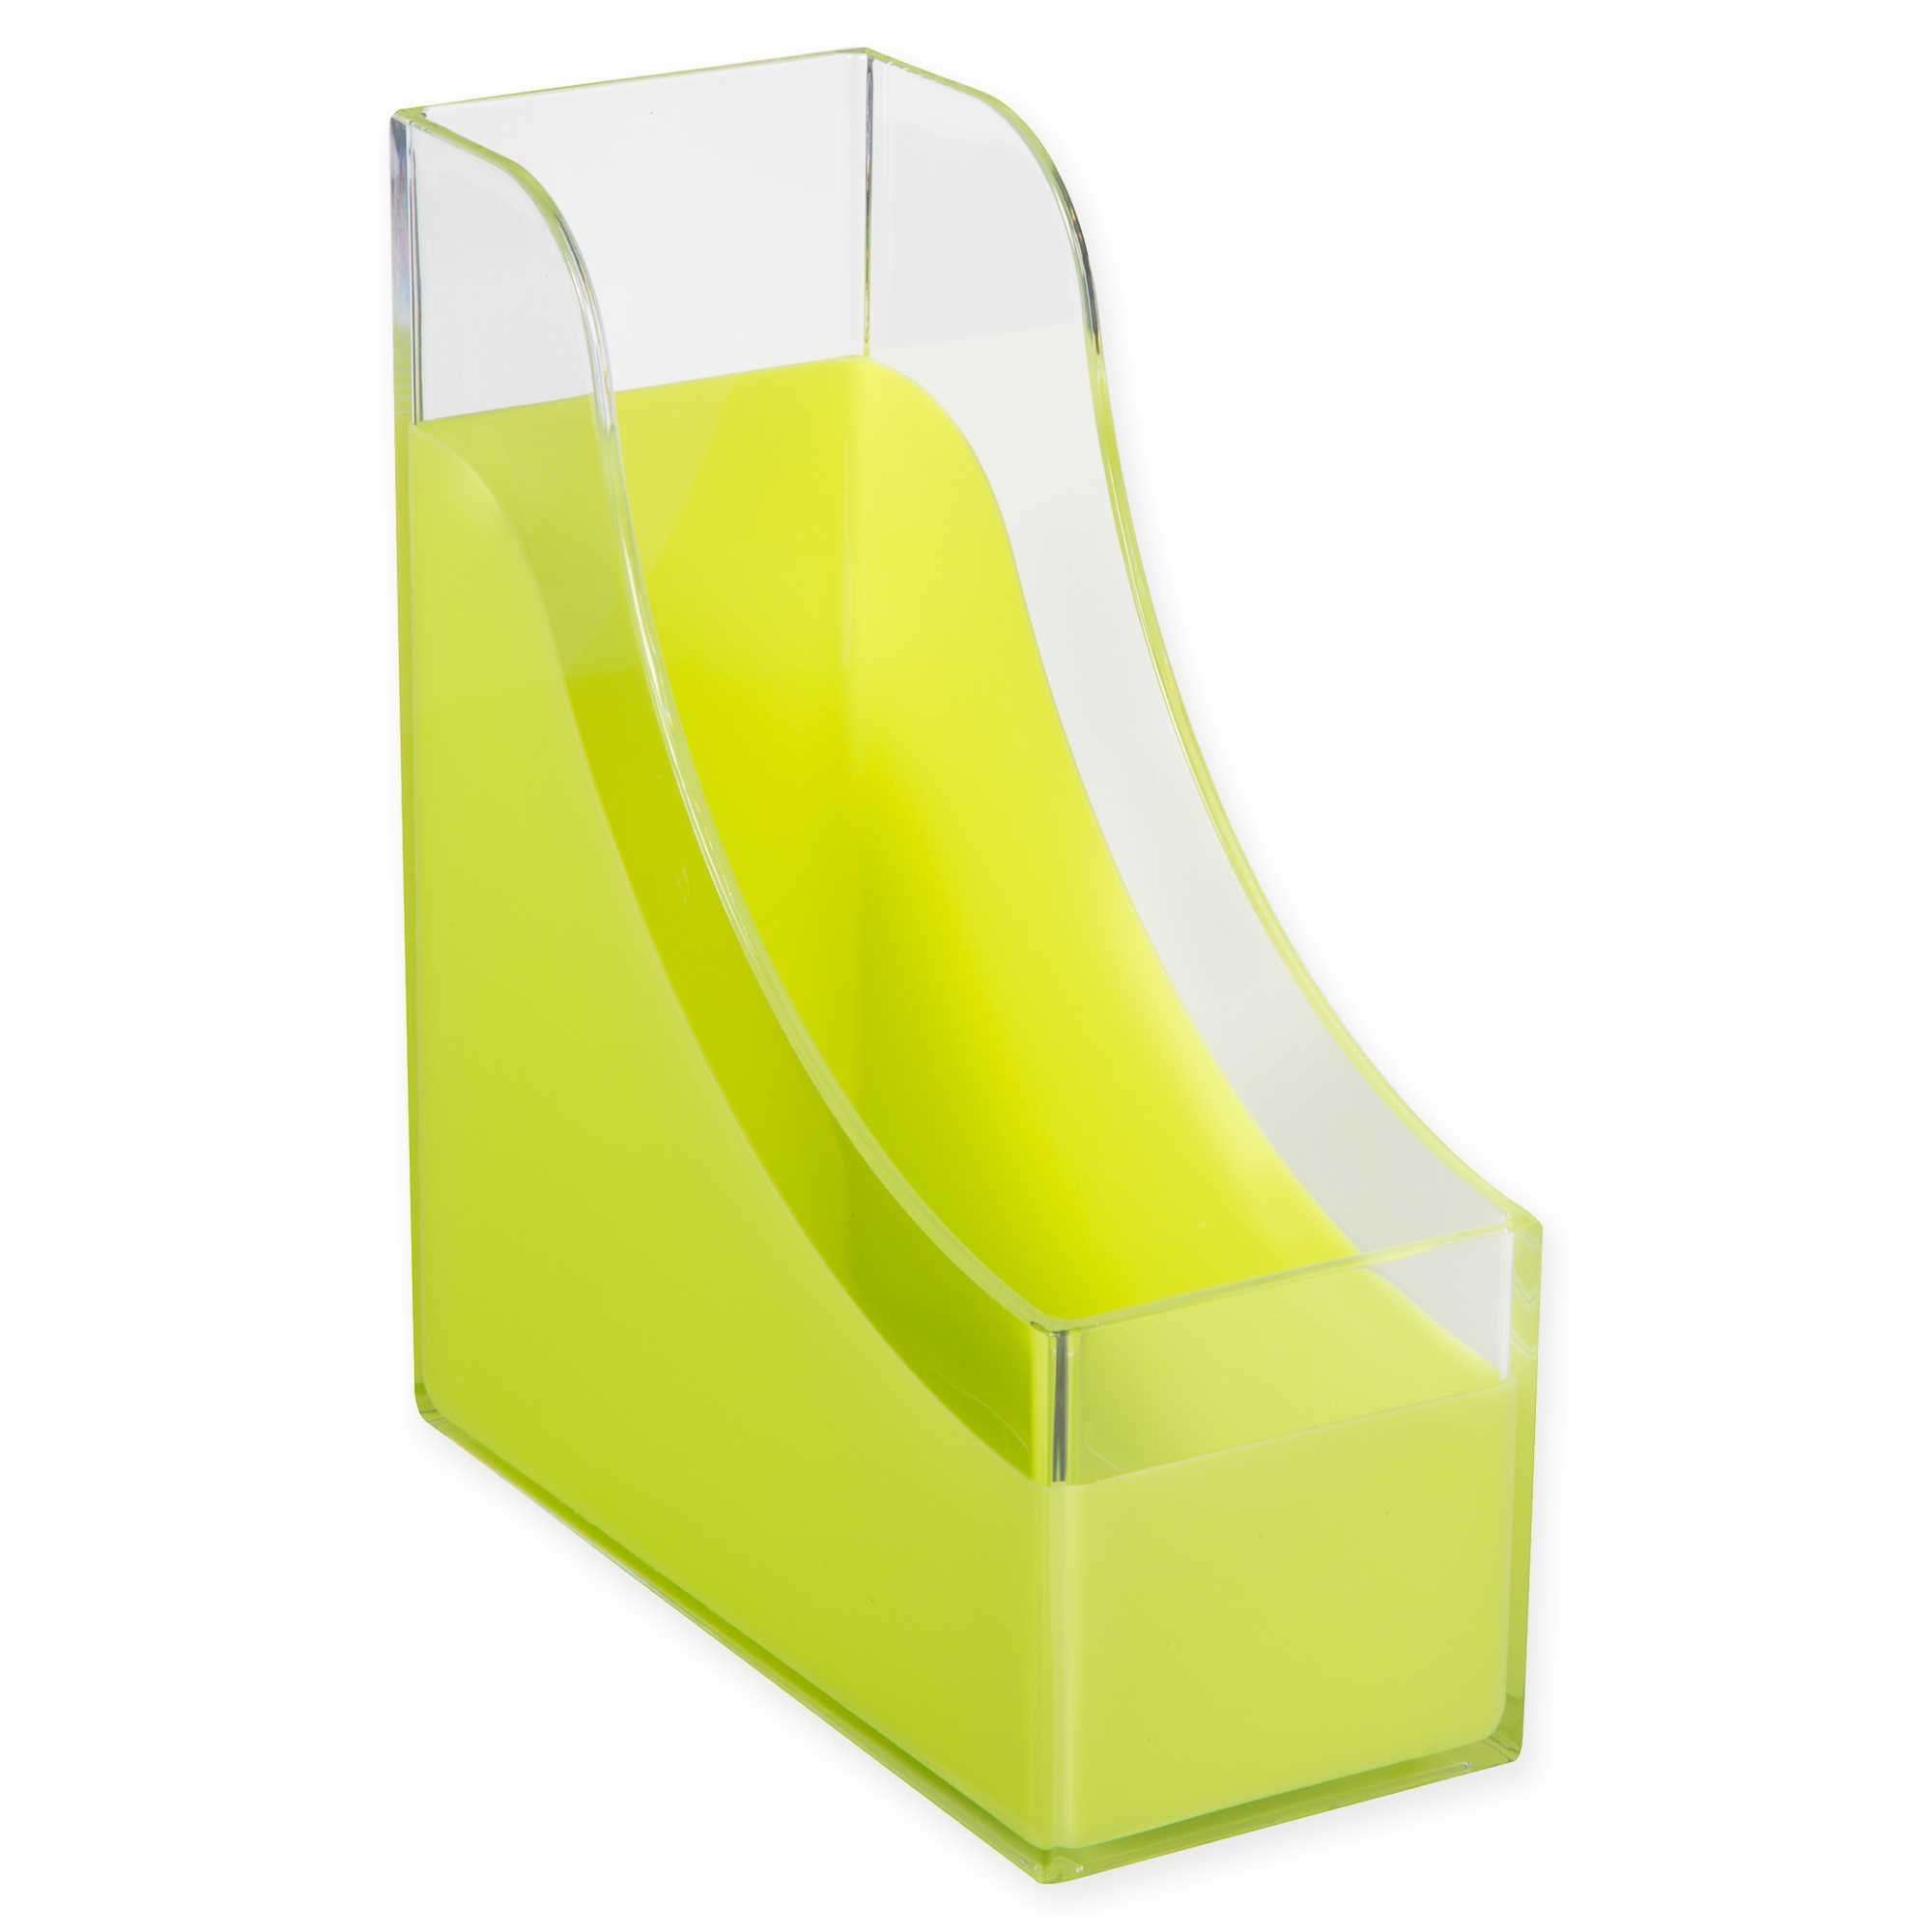 HomeCrate Modern Desk Organizer Magazine File Holder - Clear/Lime